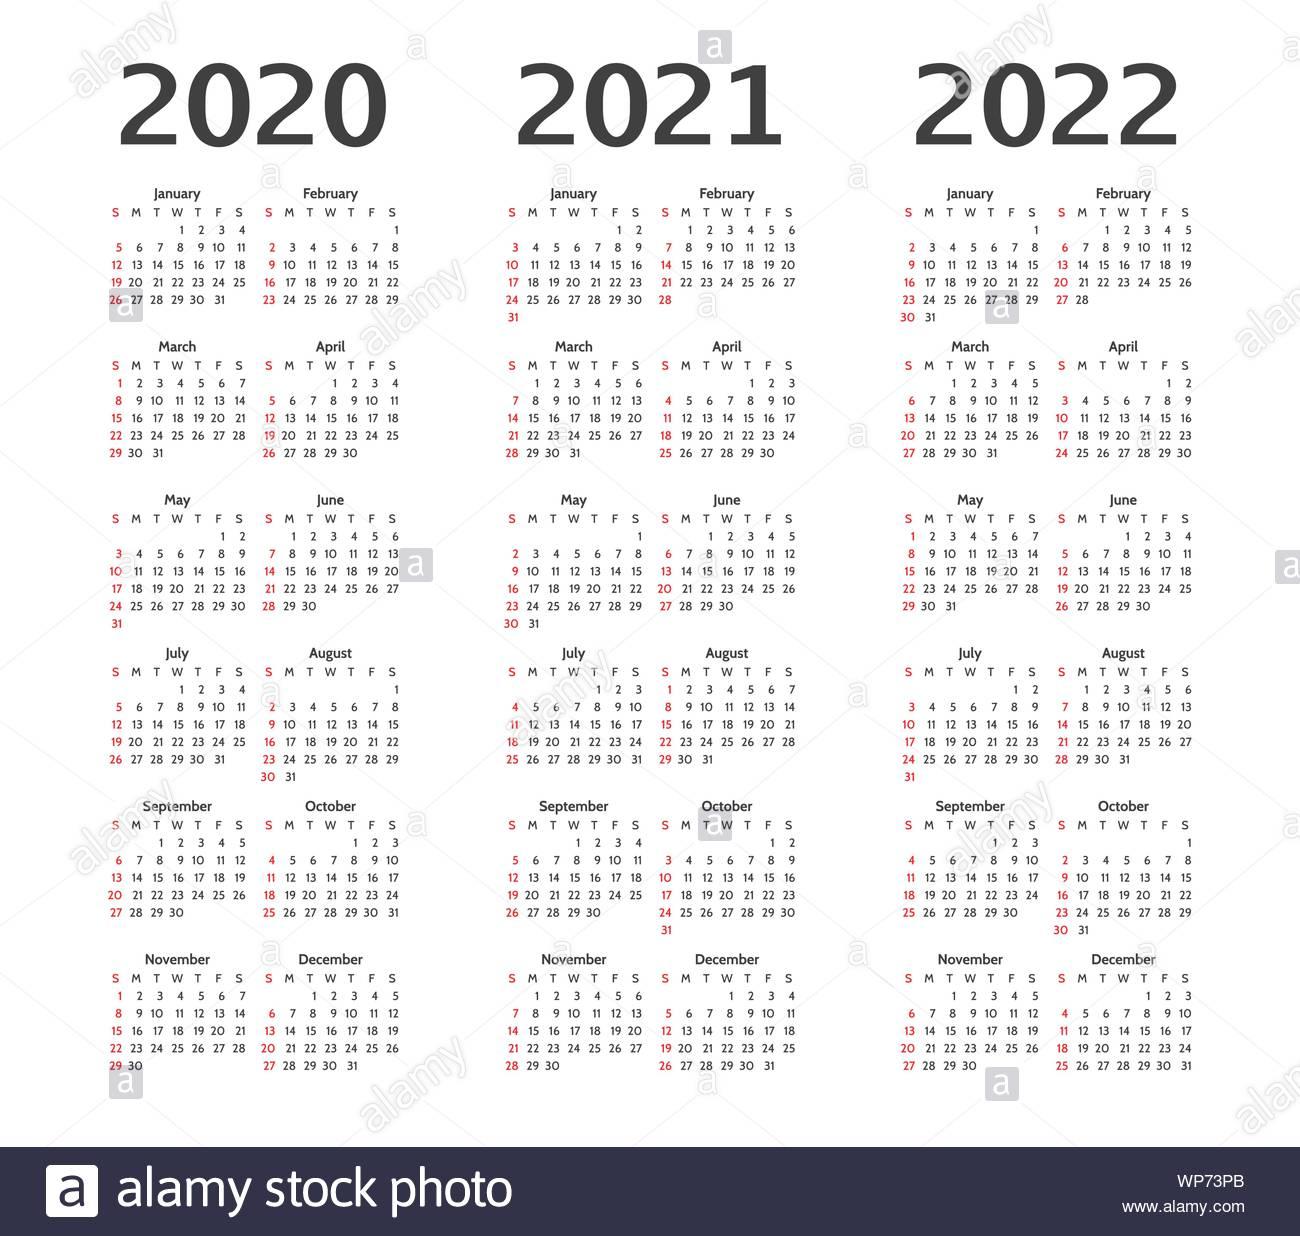 Simple Calendar Layout For 2020, 2021, 2022 Years. Week